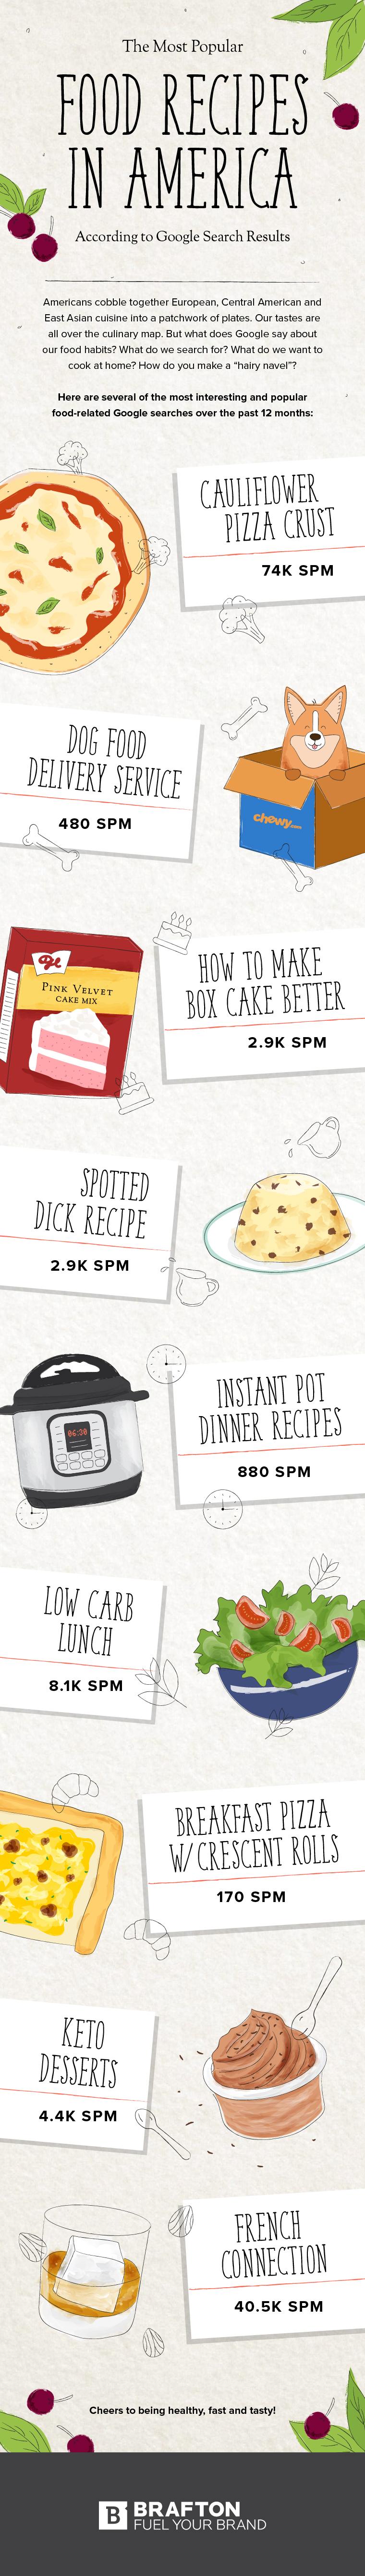 Brafton Recipes Infographic_PG.jpg